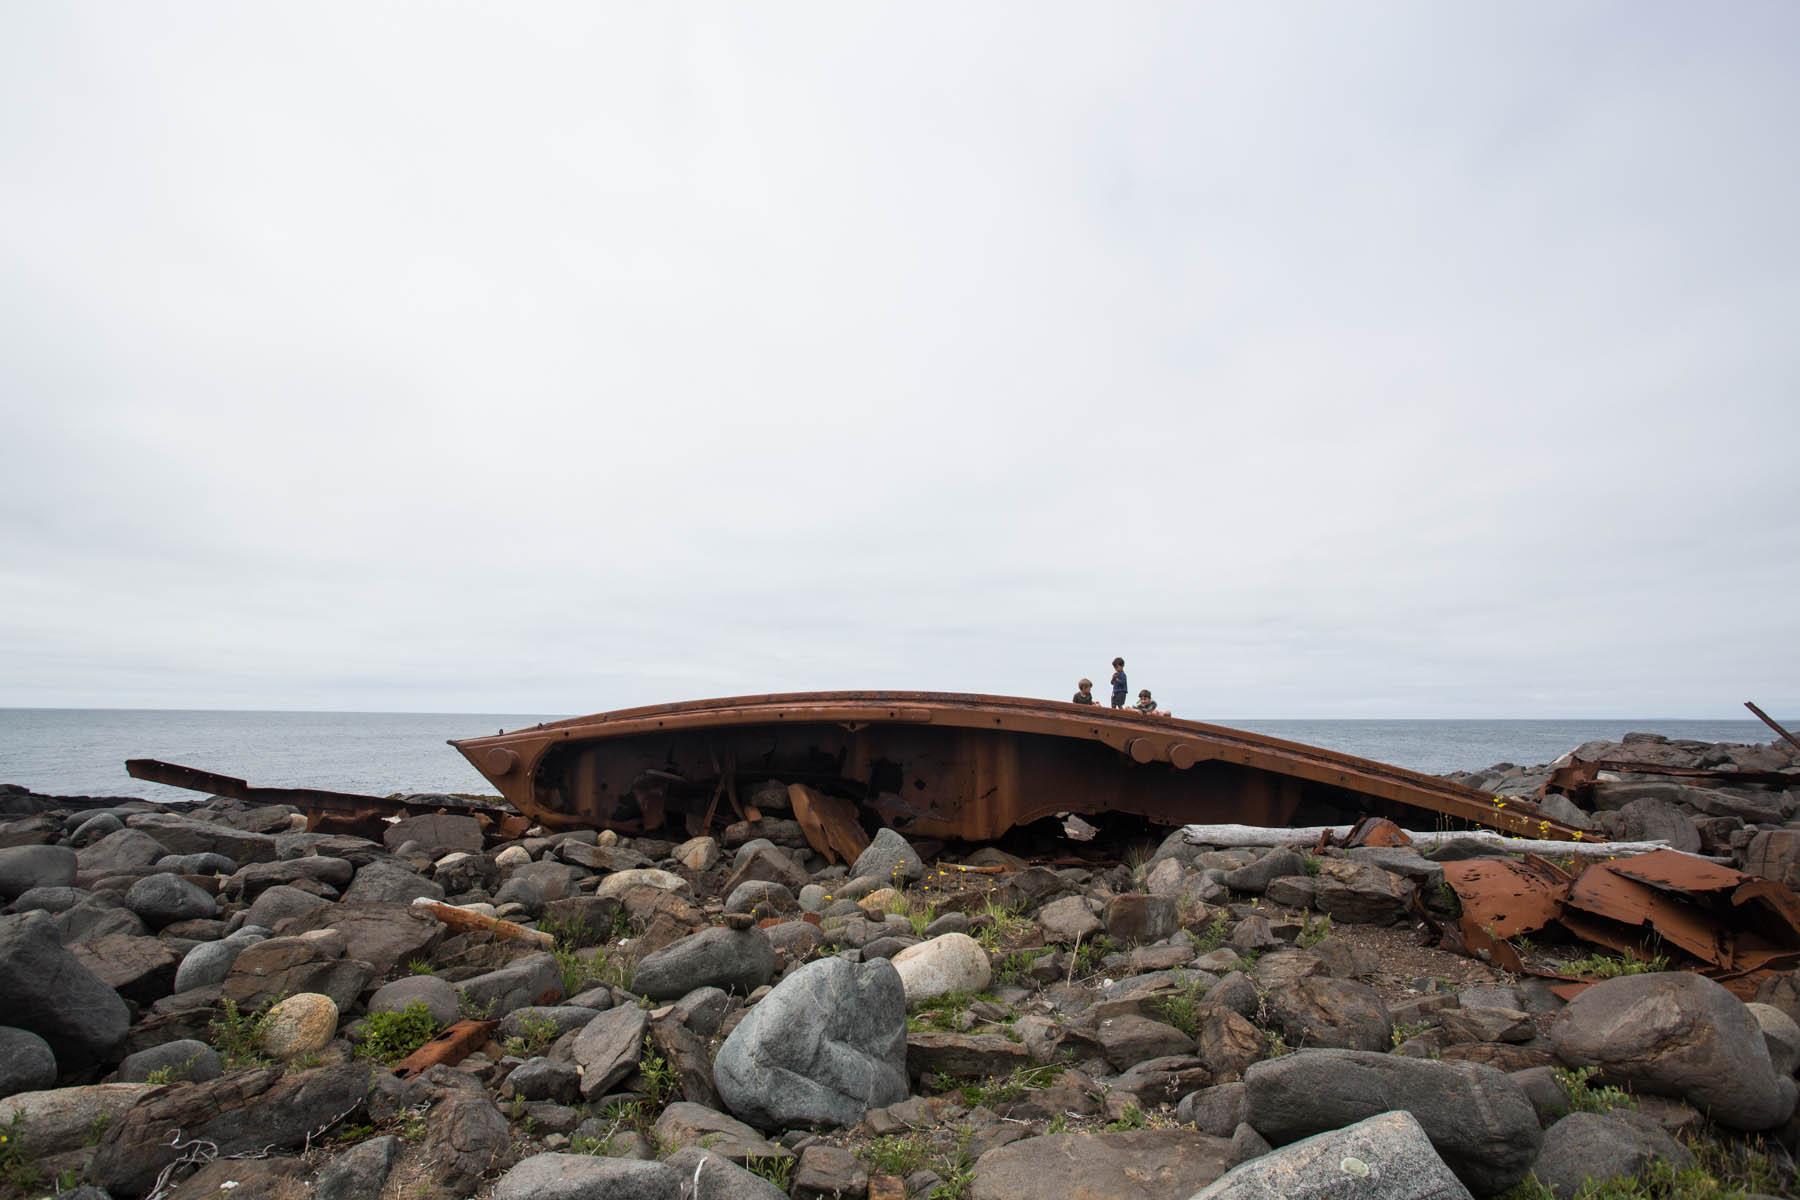 maine_shipwreck-201507250305.jpg